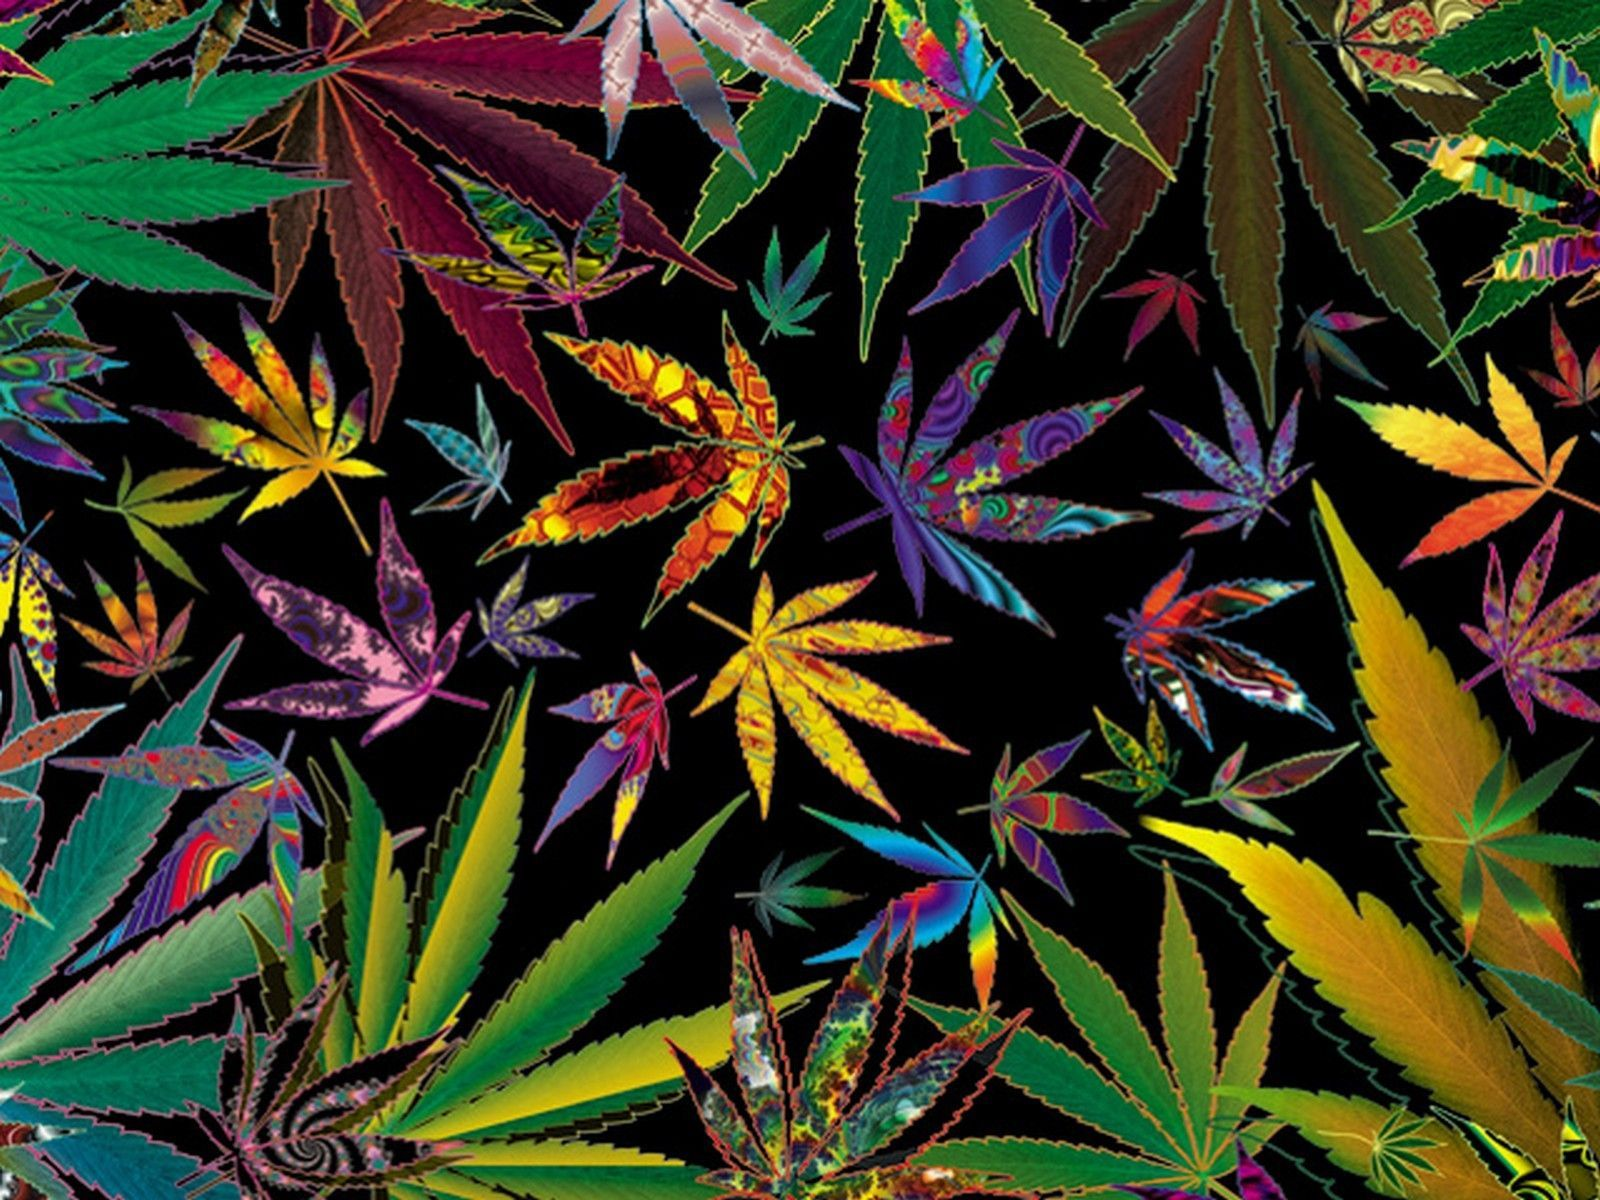 Trippy Marijuana Wallpapers Top Free Trippy Marijuana Backgrounds Wallpaperaccess